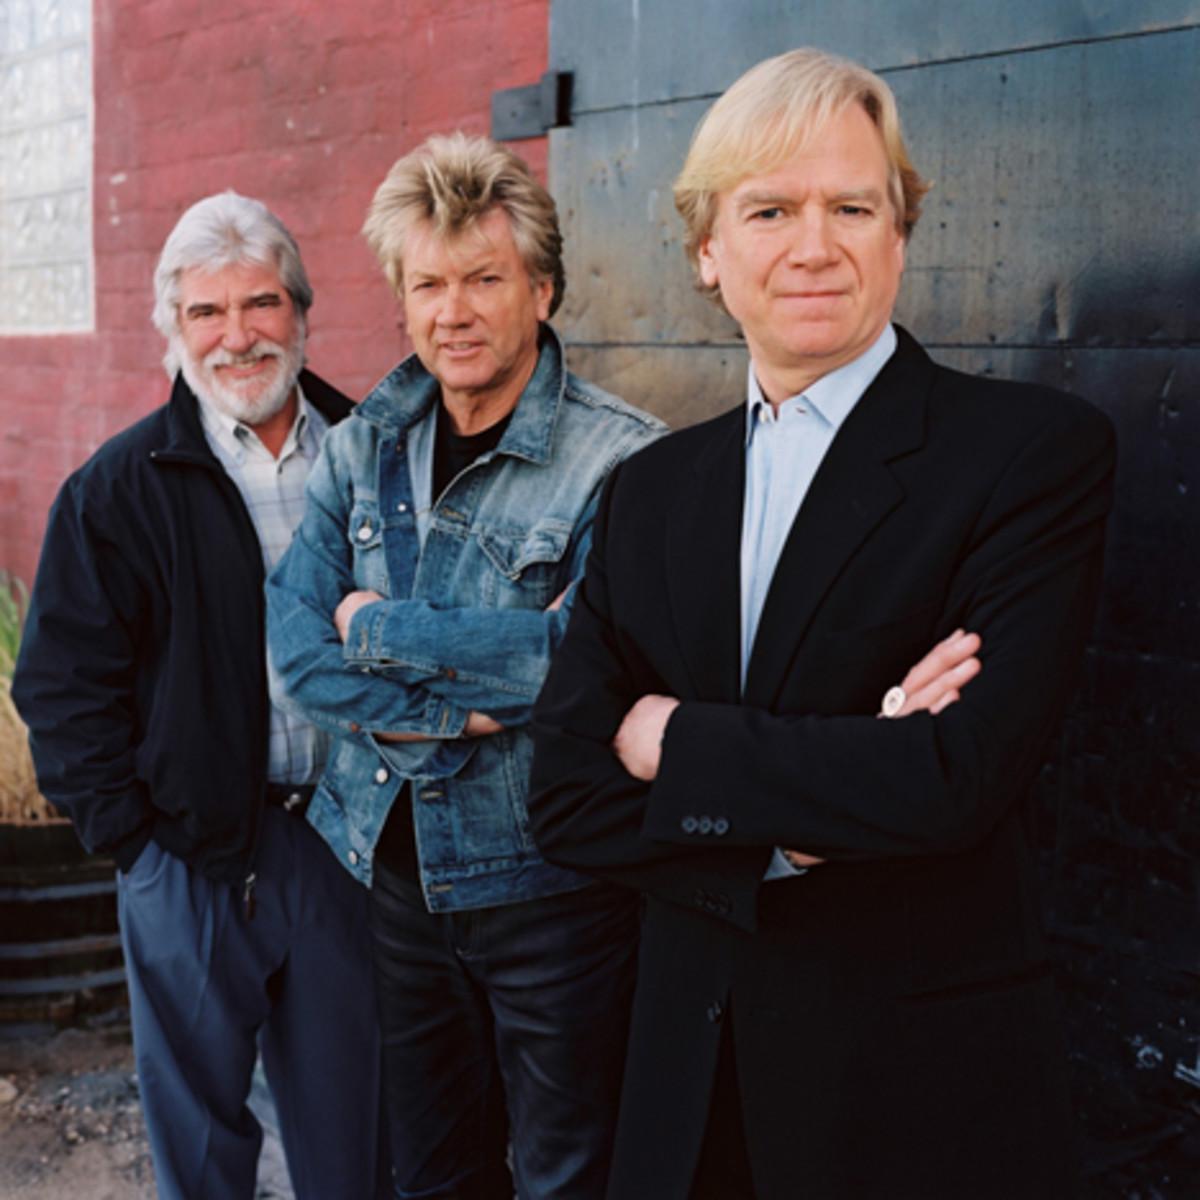 Moody Blues publicity photo